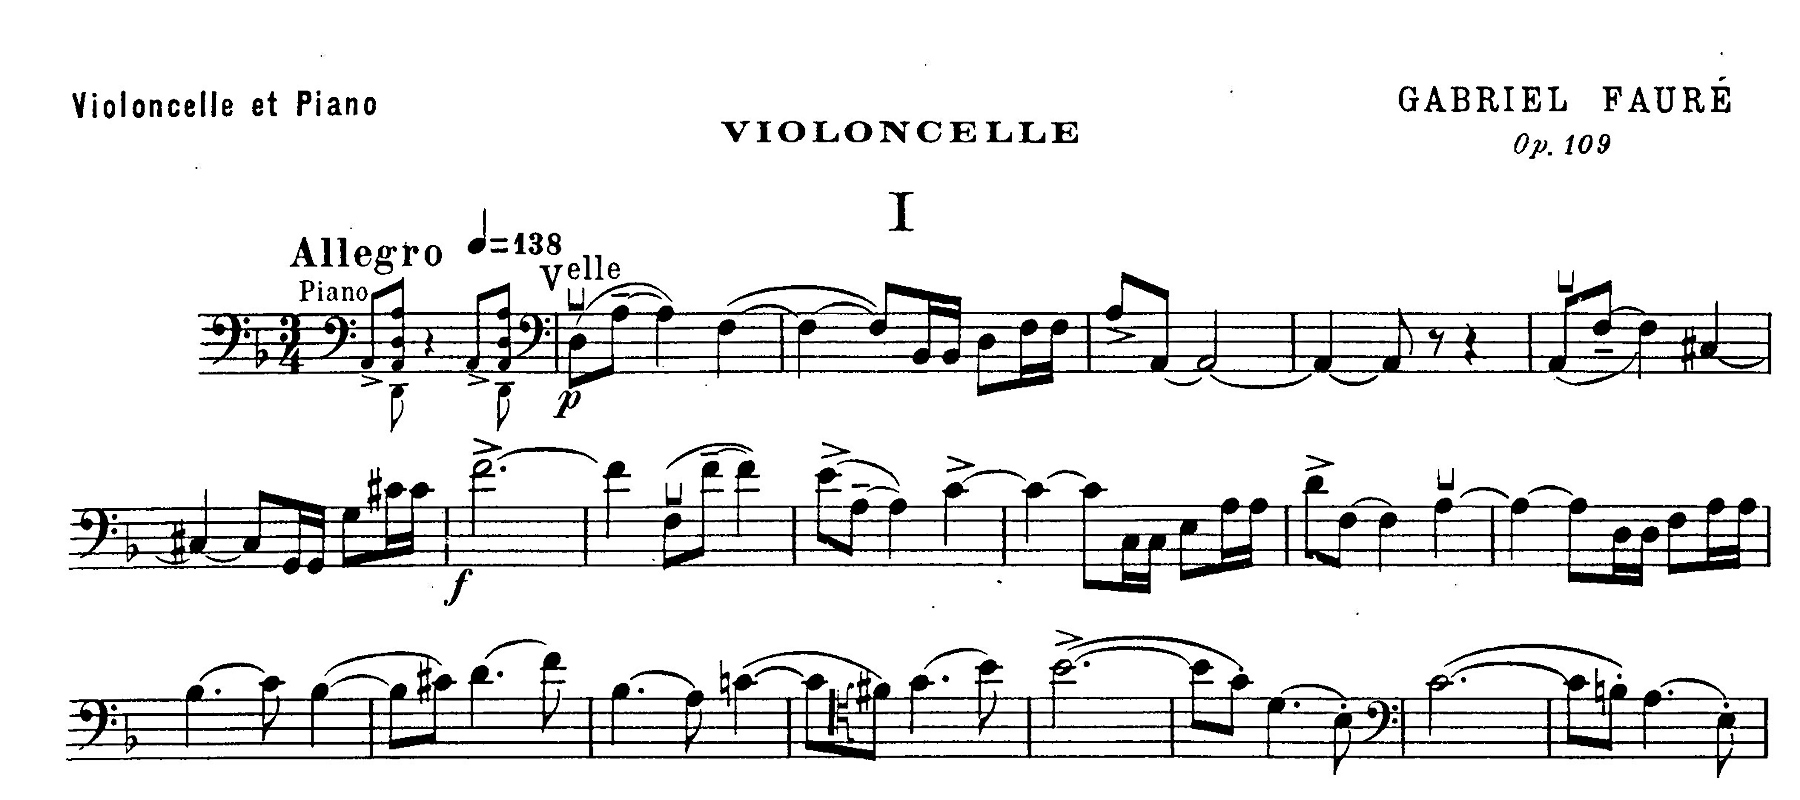 Figure 5: Gabriel Fauré: Sonate op.109, first movement, bars 1–21. First edition, cello part (1918).